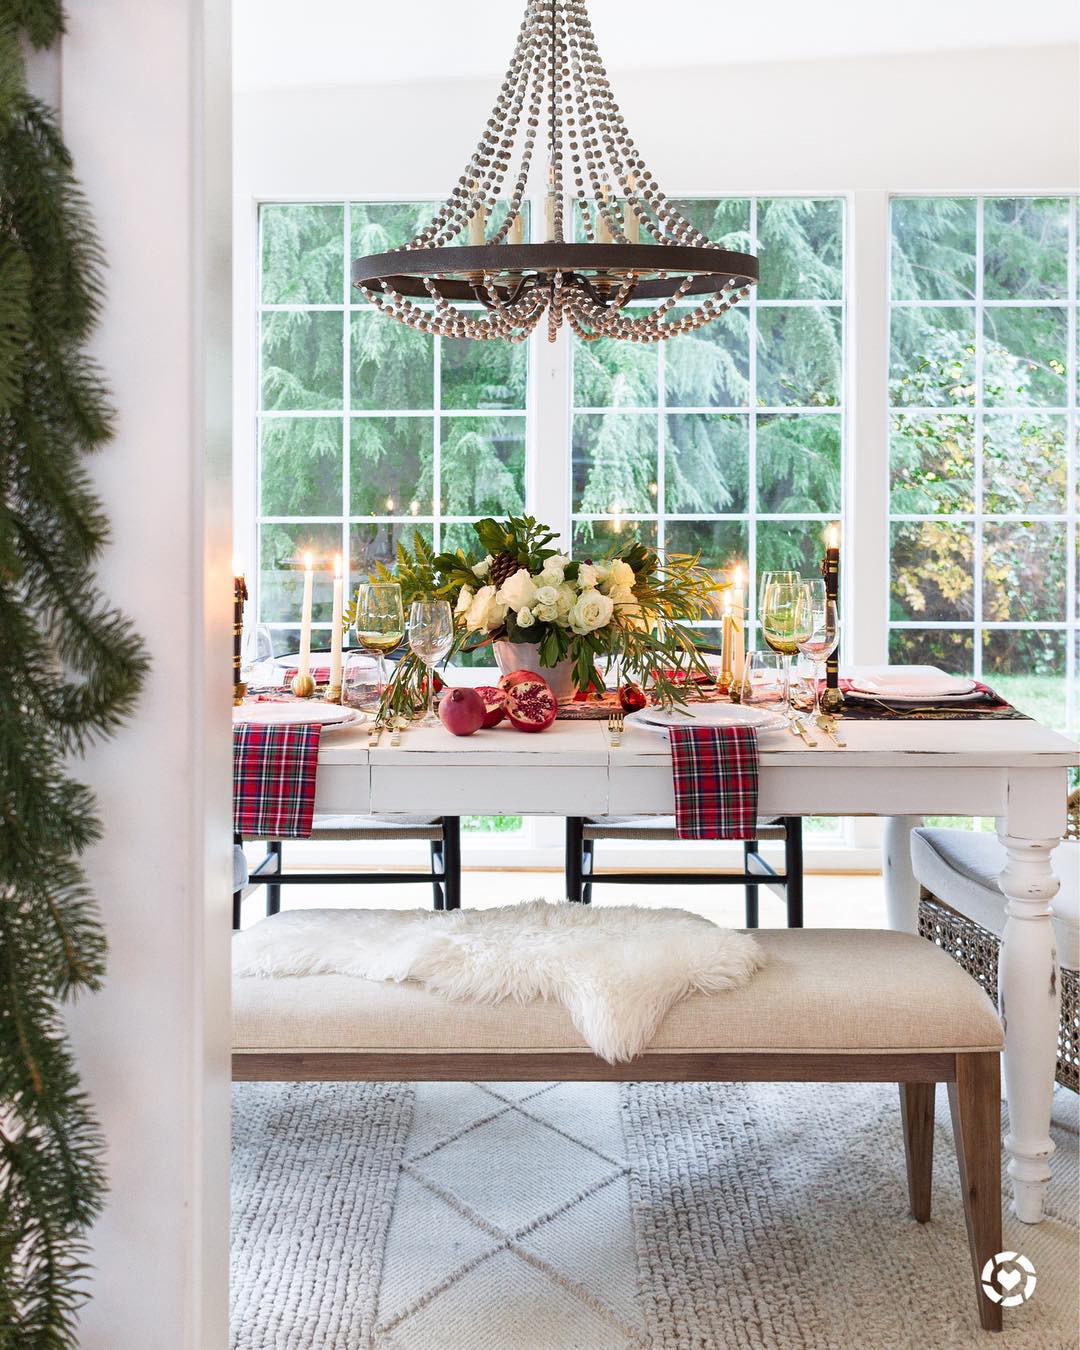 Christmas Tablescape Ideas   ZevyJoy Blog